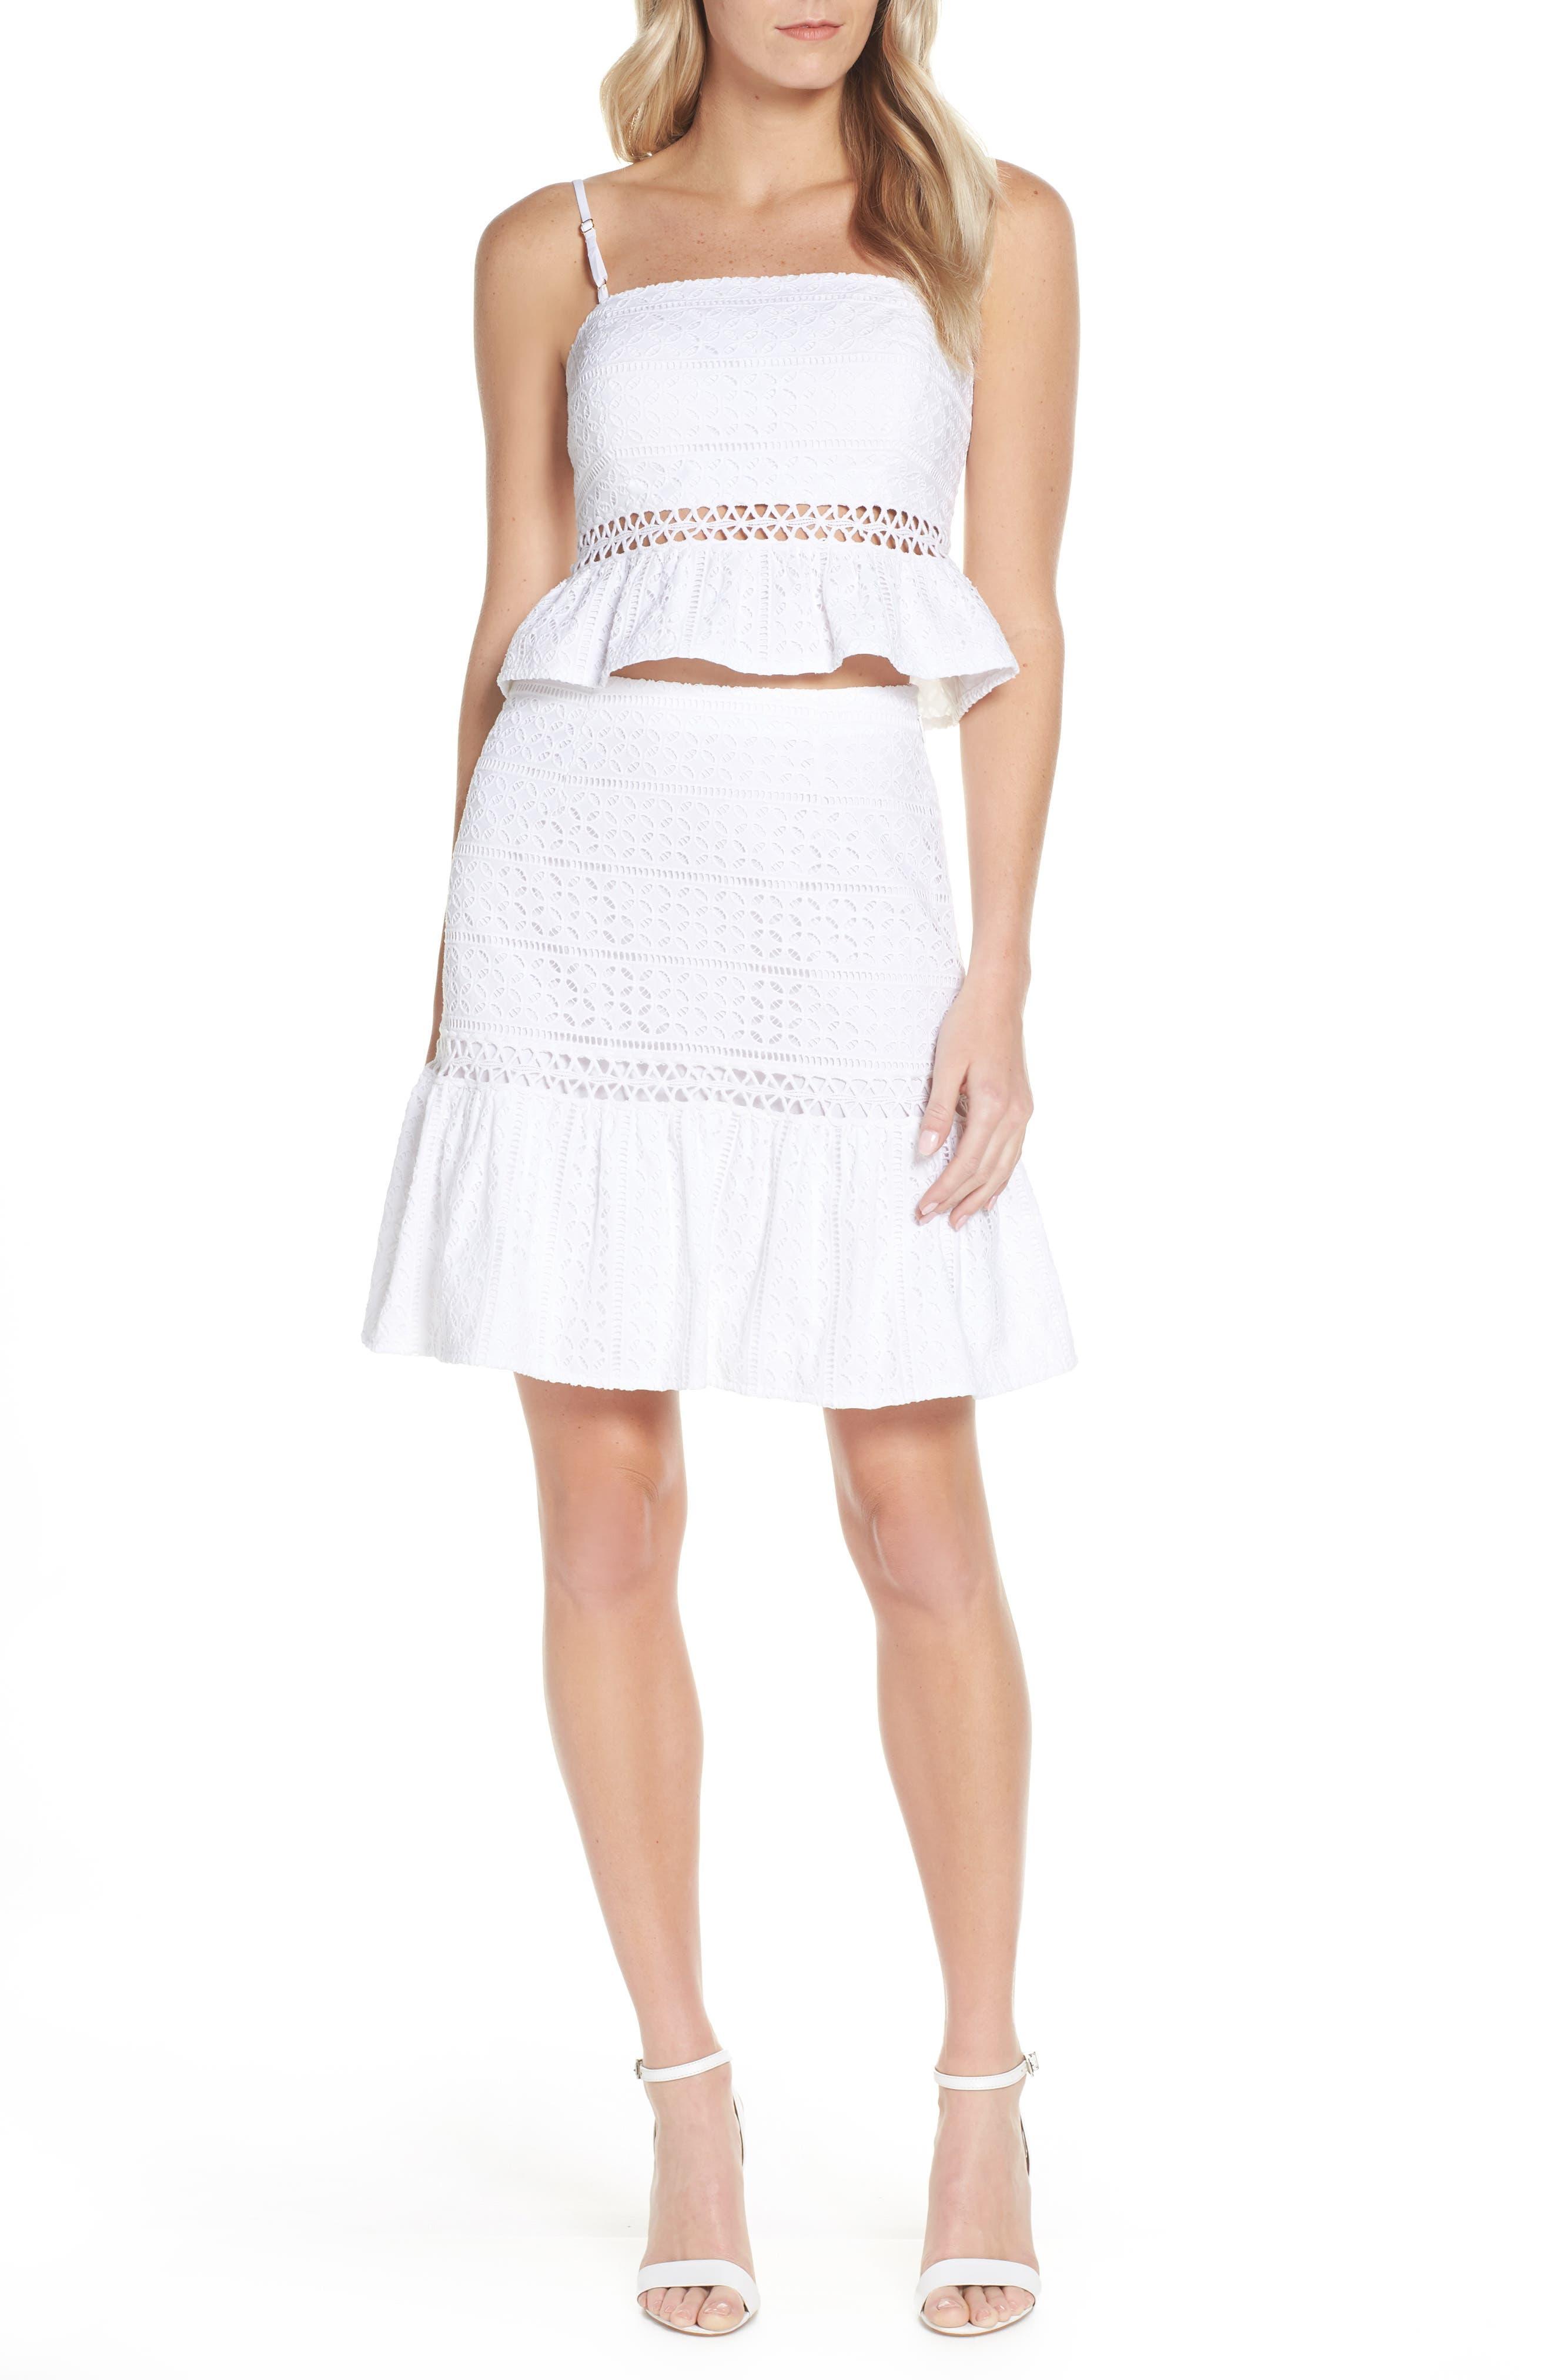 Lilly Pulitzer Jan Peplum Crop Top & Skirt Set, White